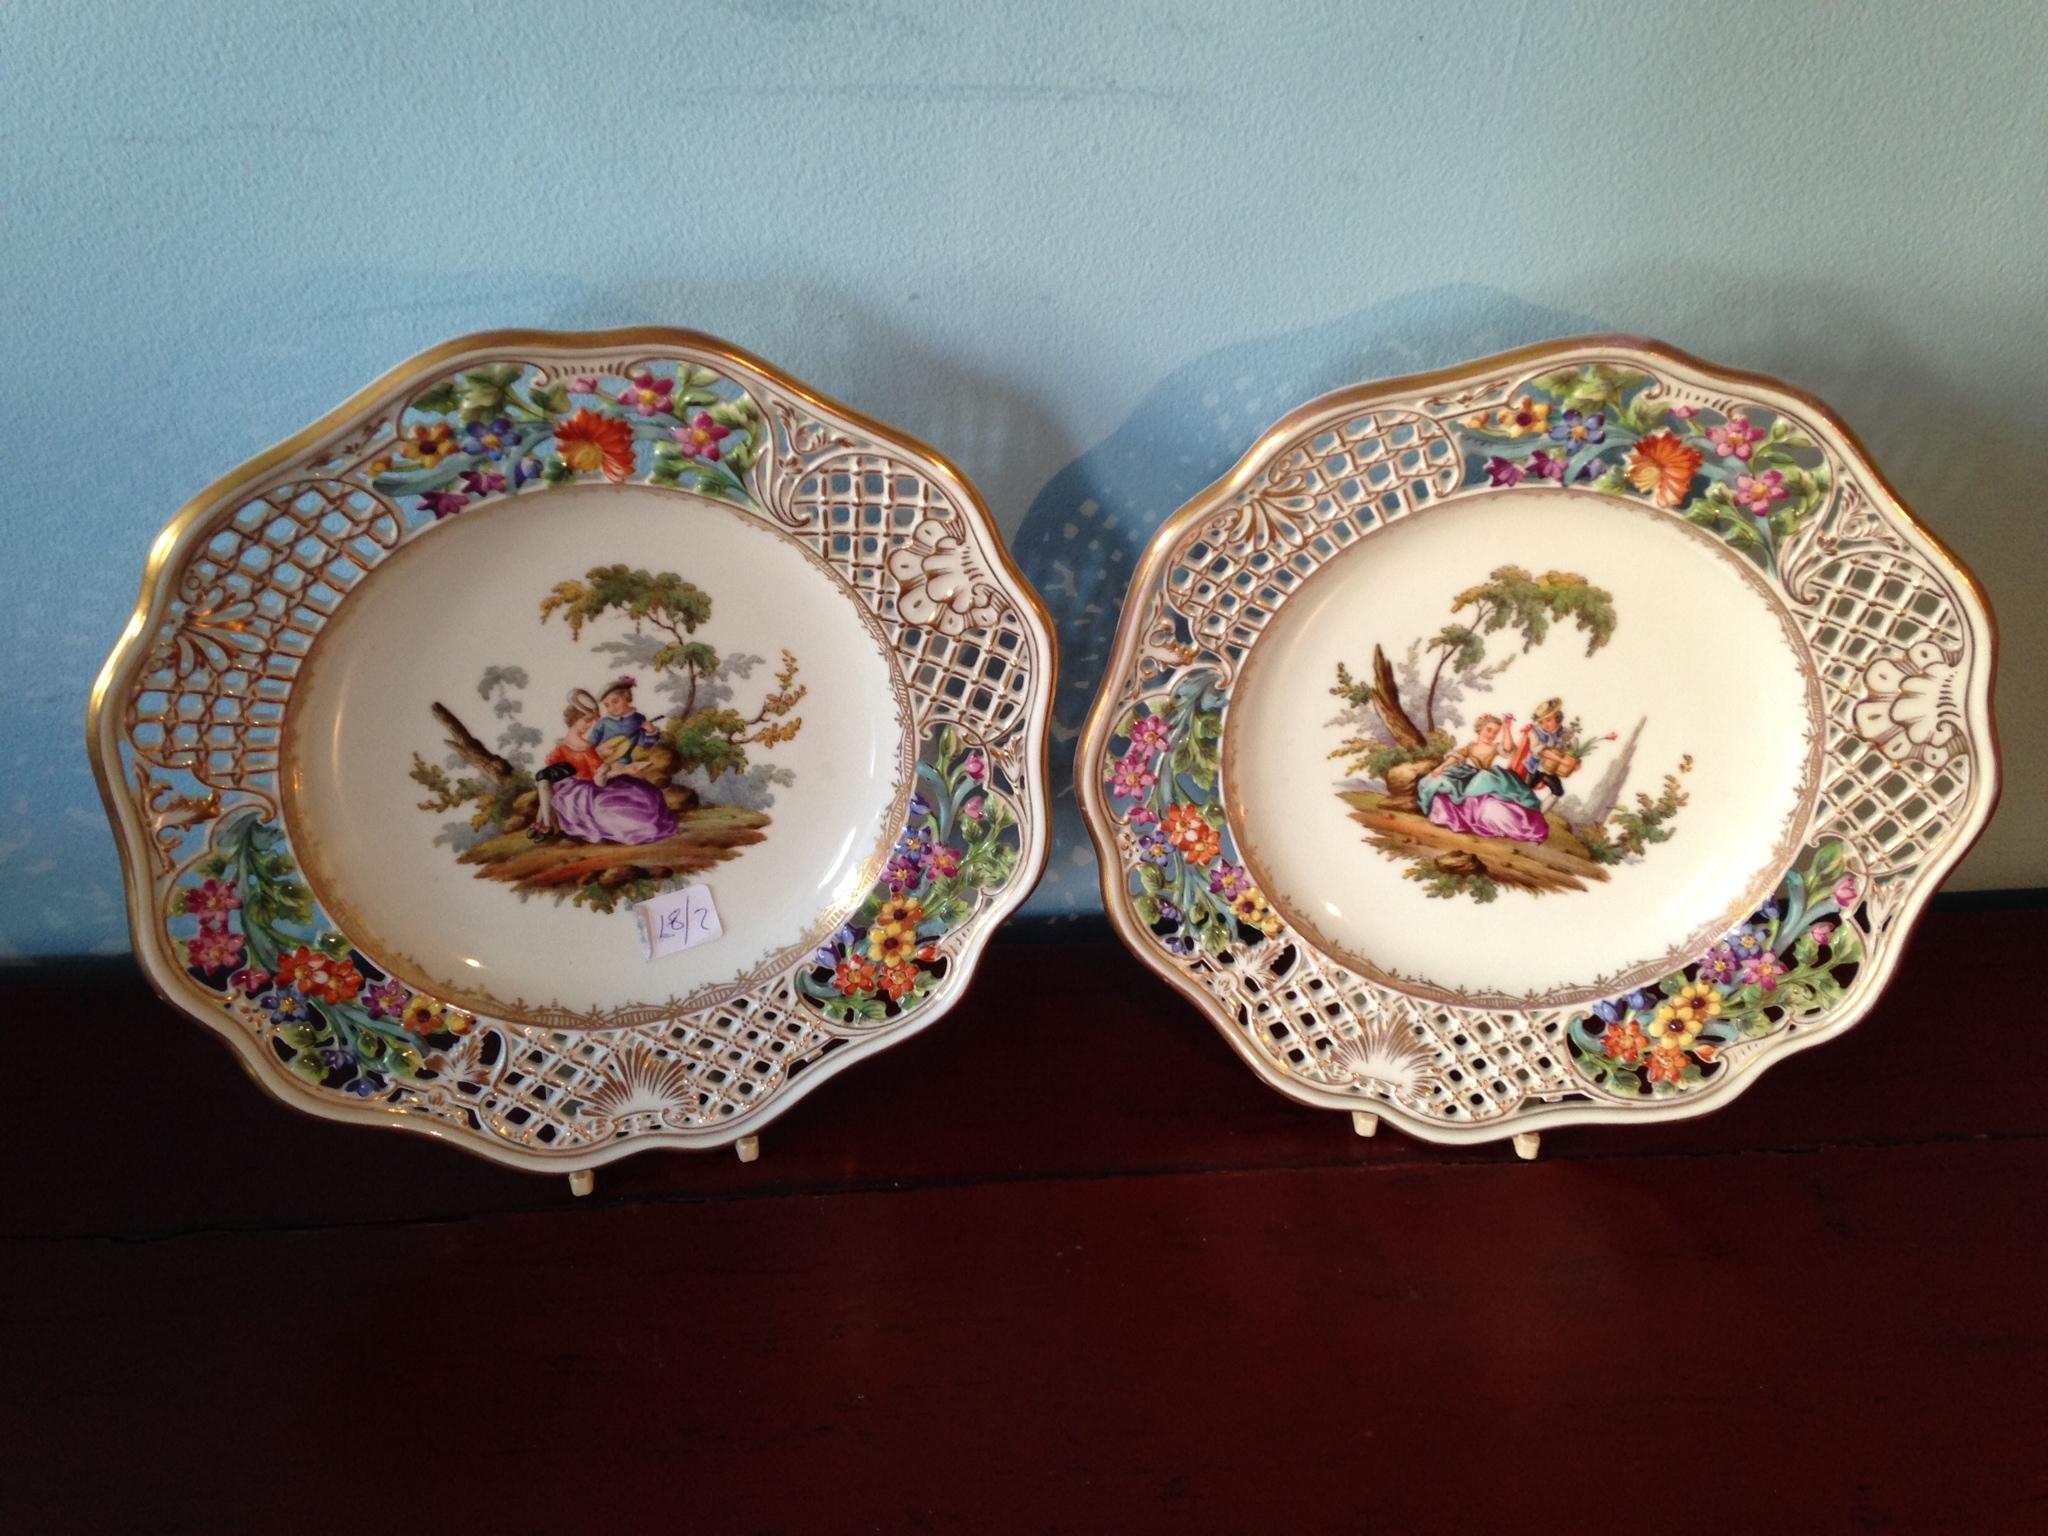 Lot 12 - Pair Meissen porcelain plates slight a/f to glaze 20 cms diam